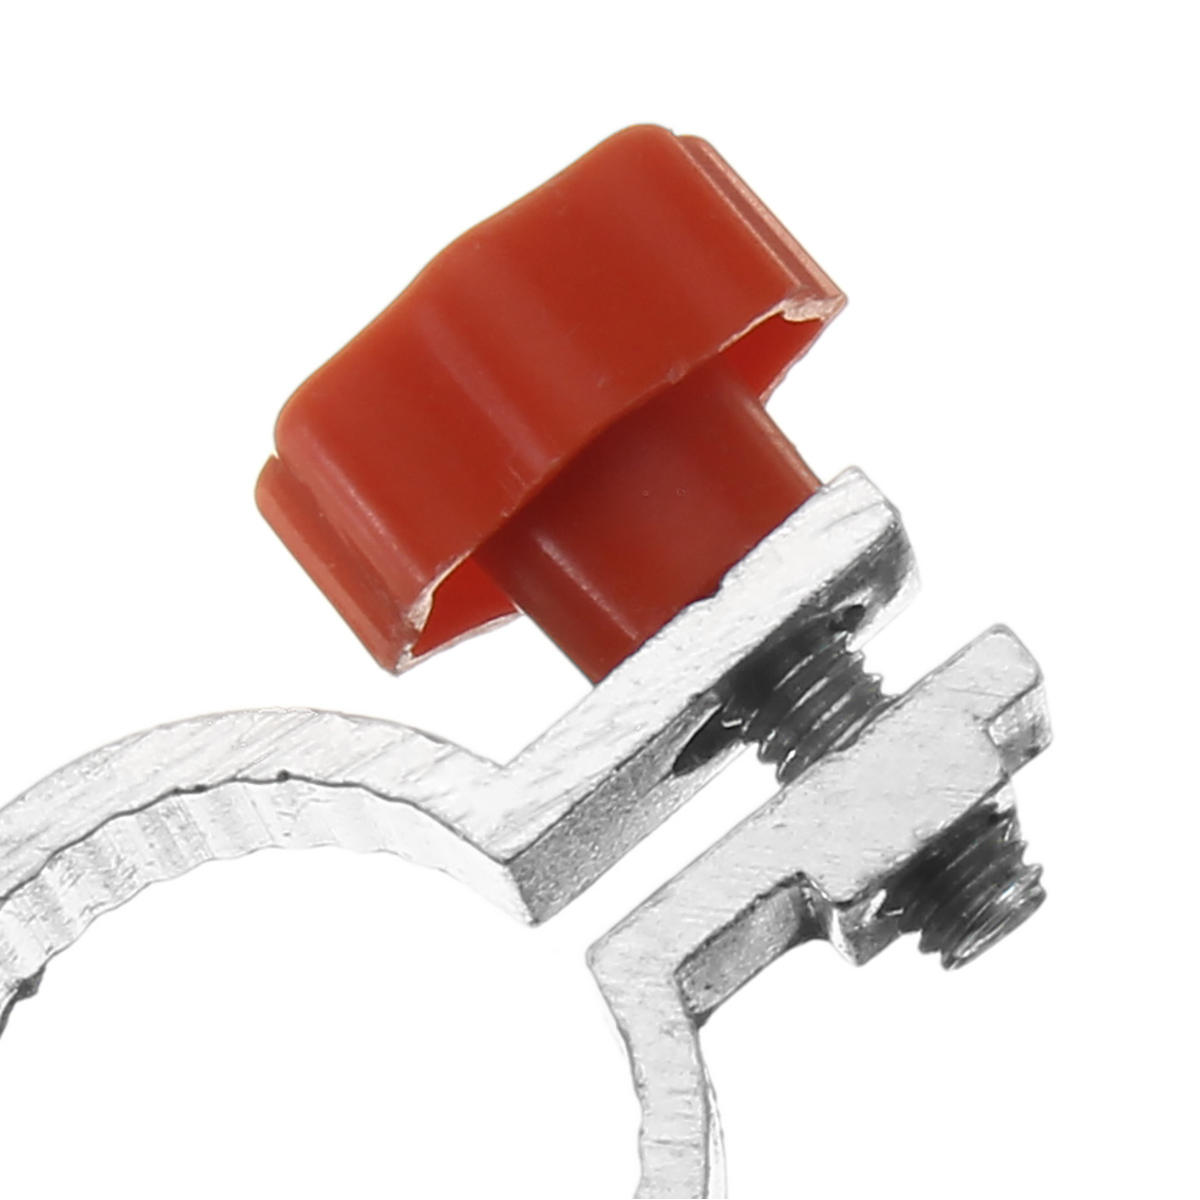 Aluminum Alloy Universal Adjustable Fishing Light Holder